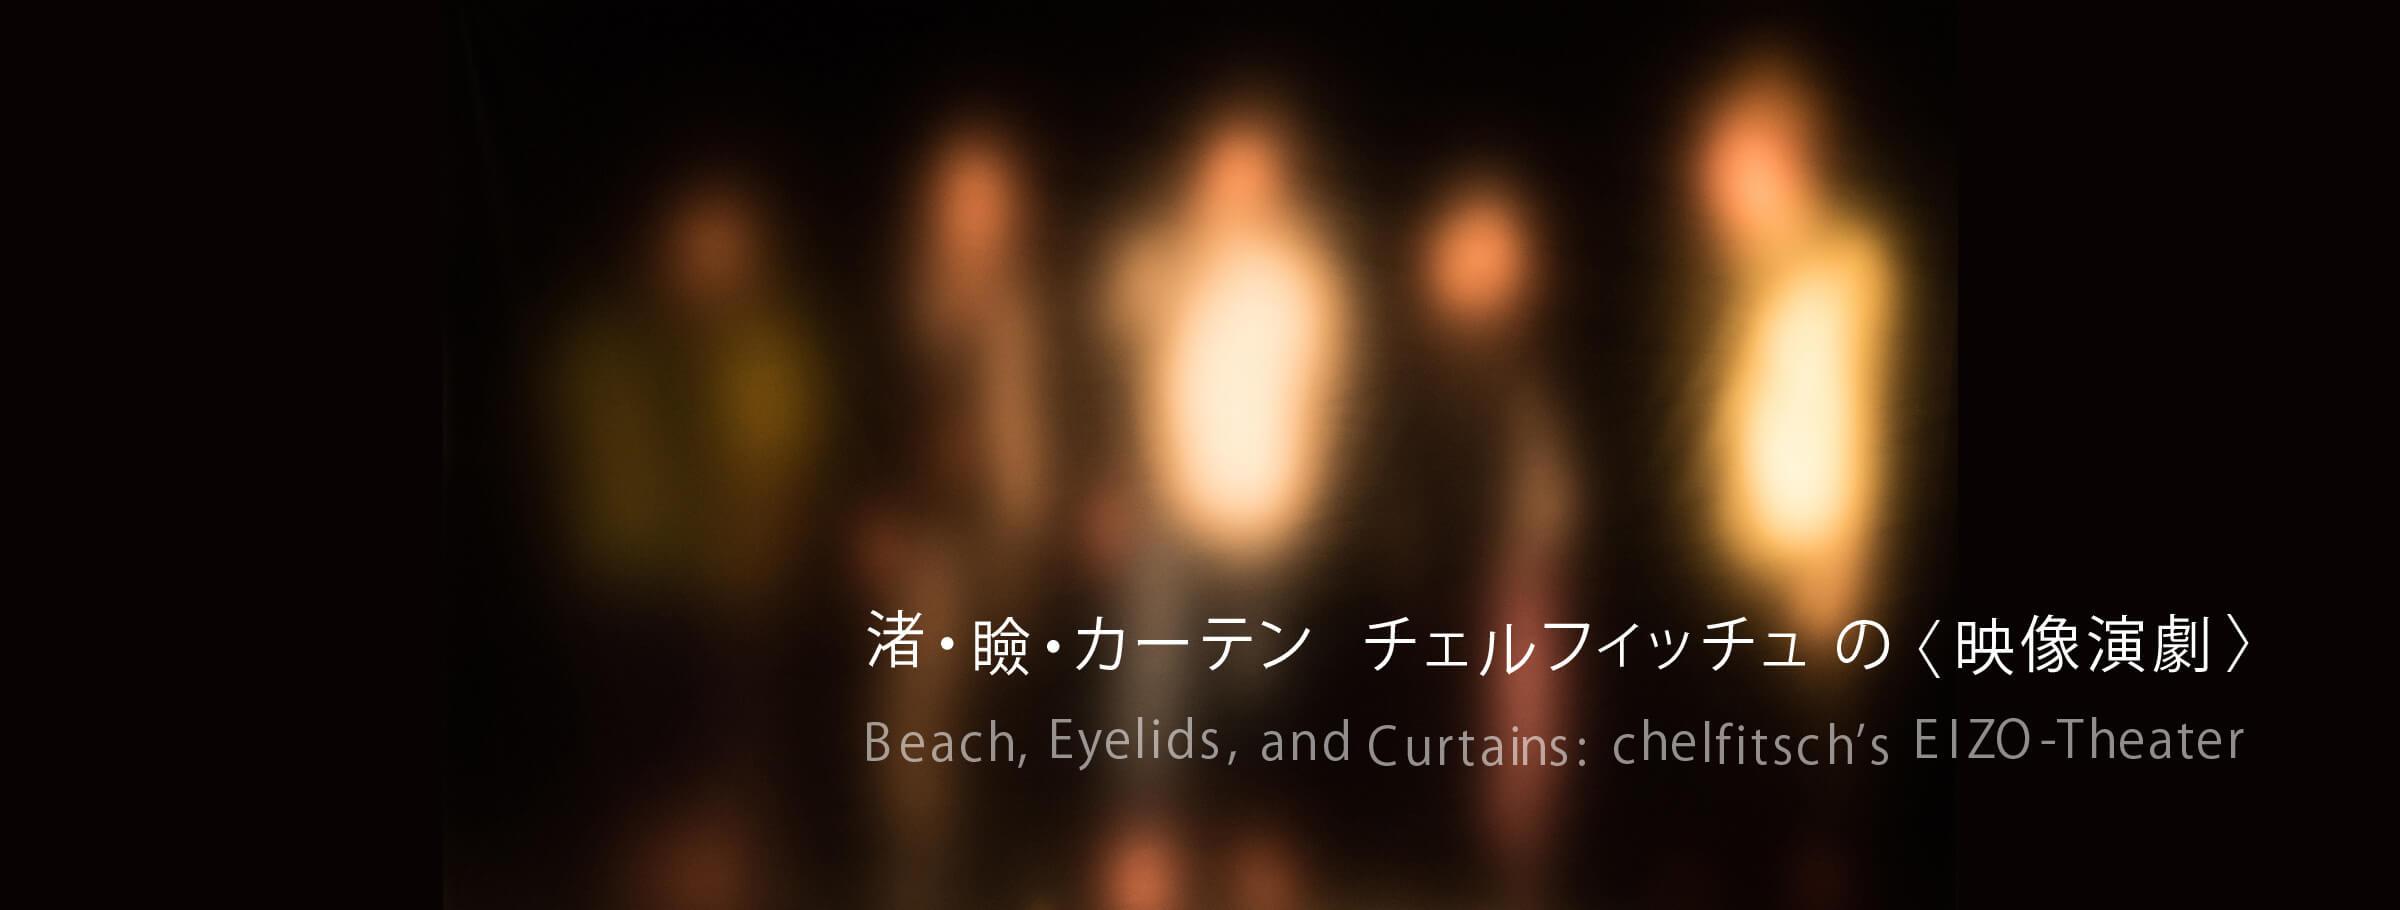 Beach, Eyelids, and Curtains: chelfitsch's Eizo-Theater